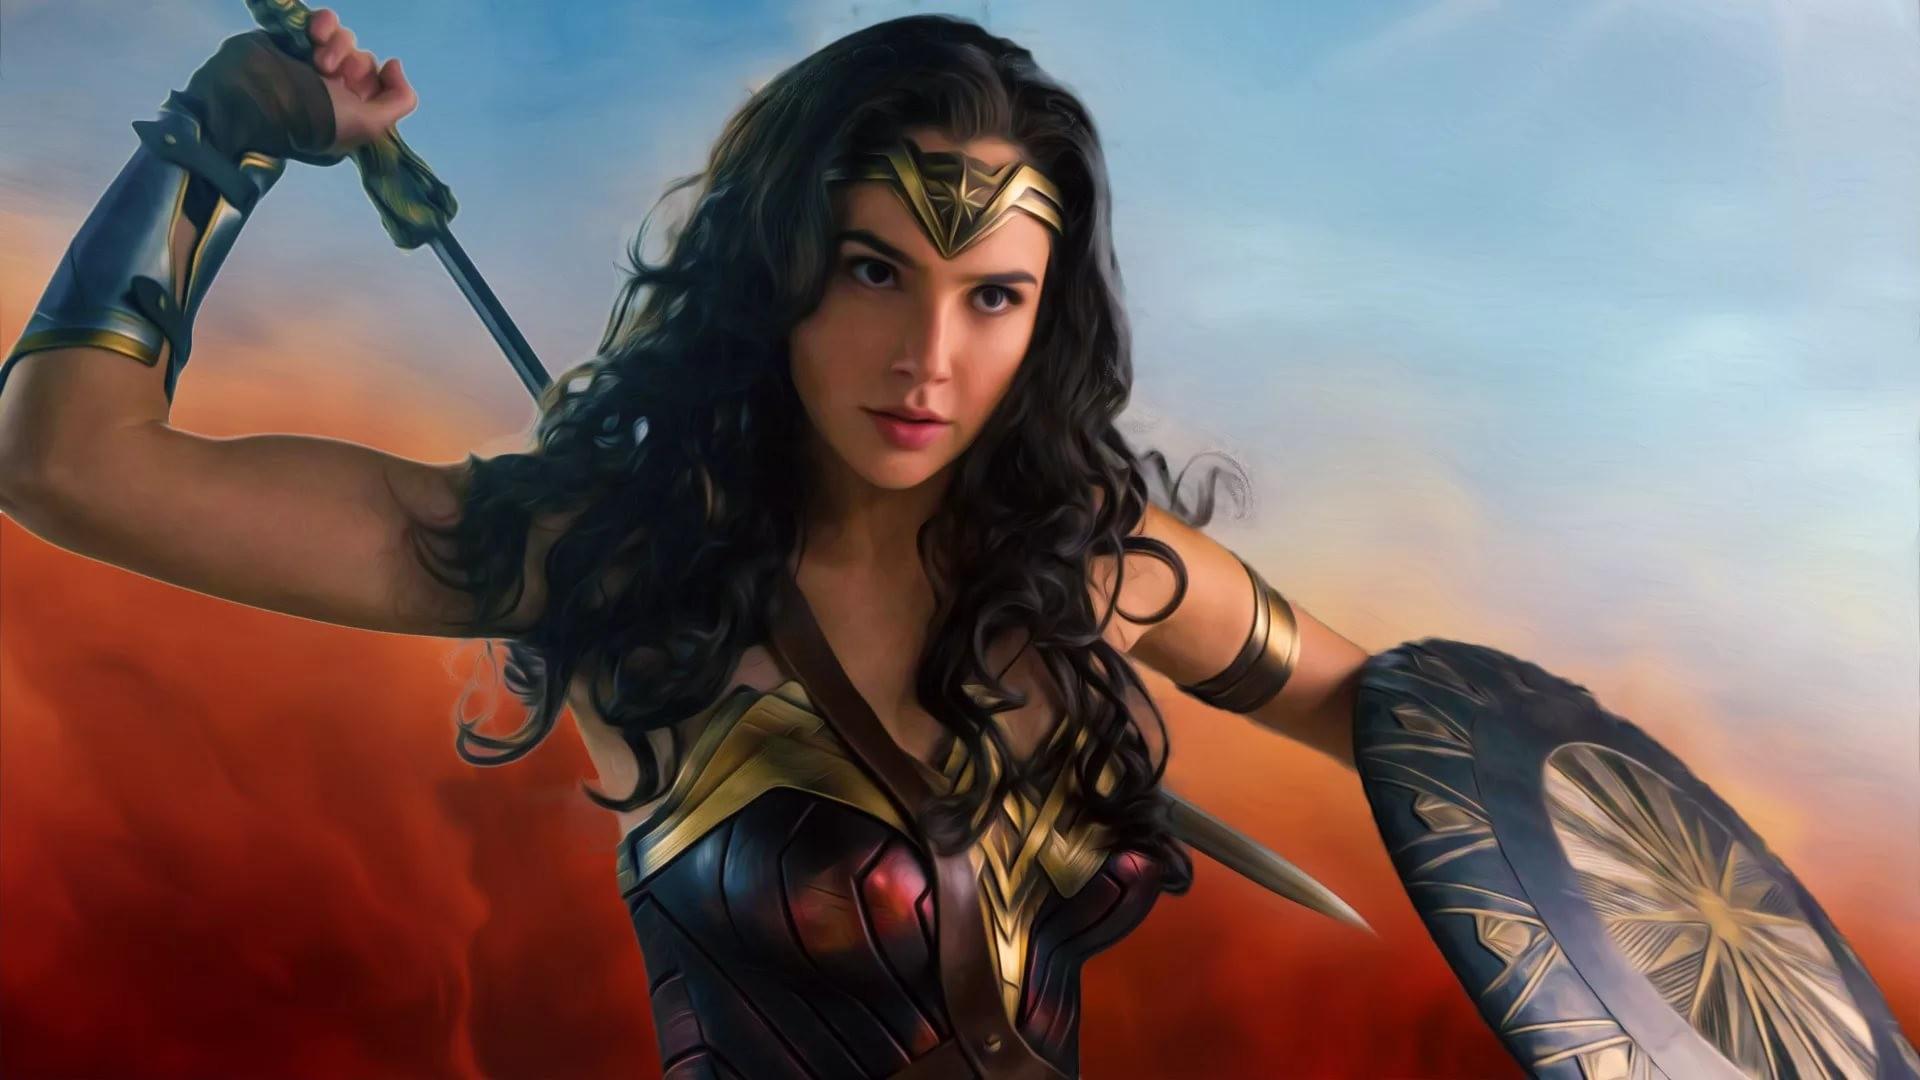 2017 Wonder Woman Movie Fan Art Hd Movies 4k Wallpapers: Wonder Woman Wallpapers (63+ Images